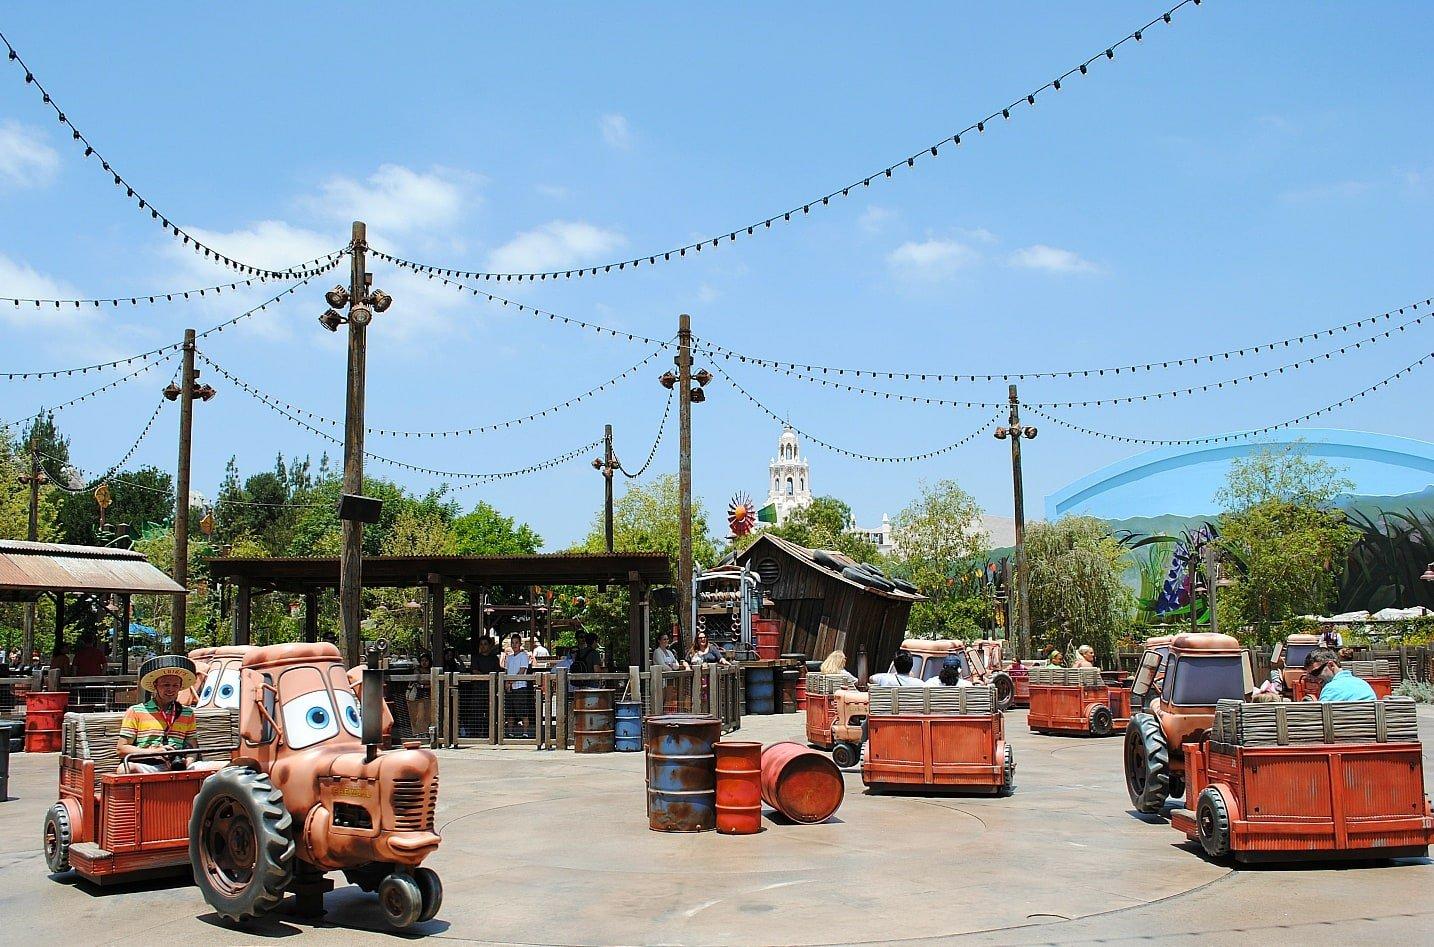 Mater's Junkyard Jamboree is like a Tilt-A-Whirl but way better ~ Scariest Rides at Disneyland